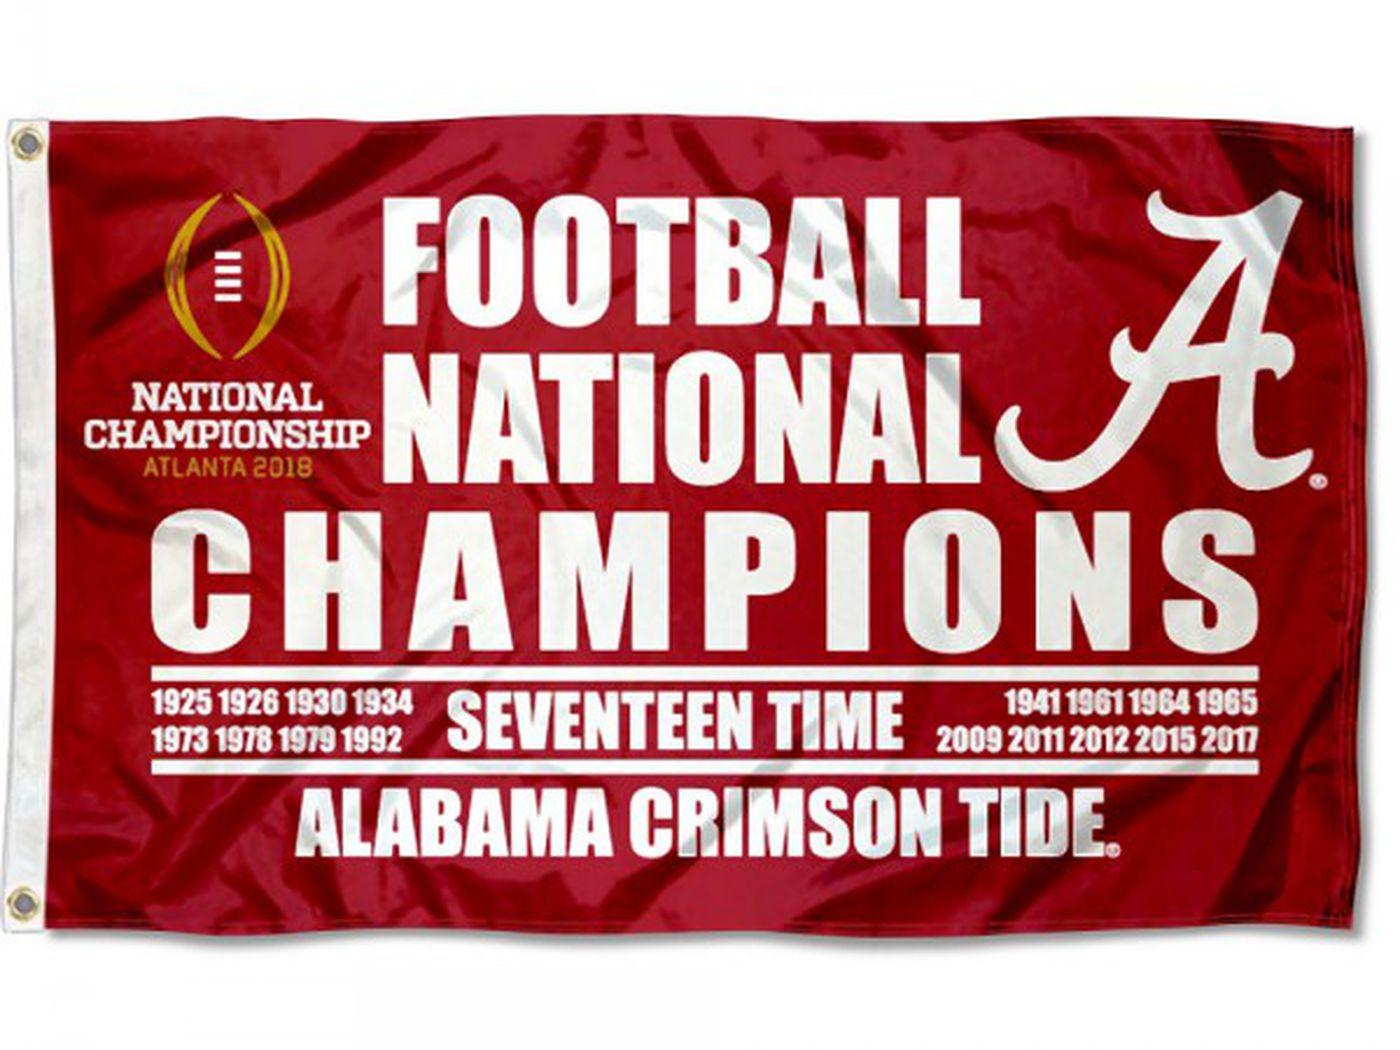 Alabama 1941 national championship claim is CFB's silliest